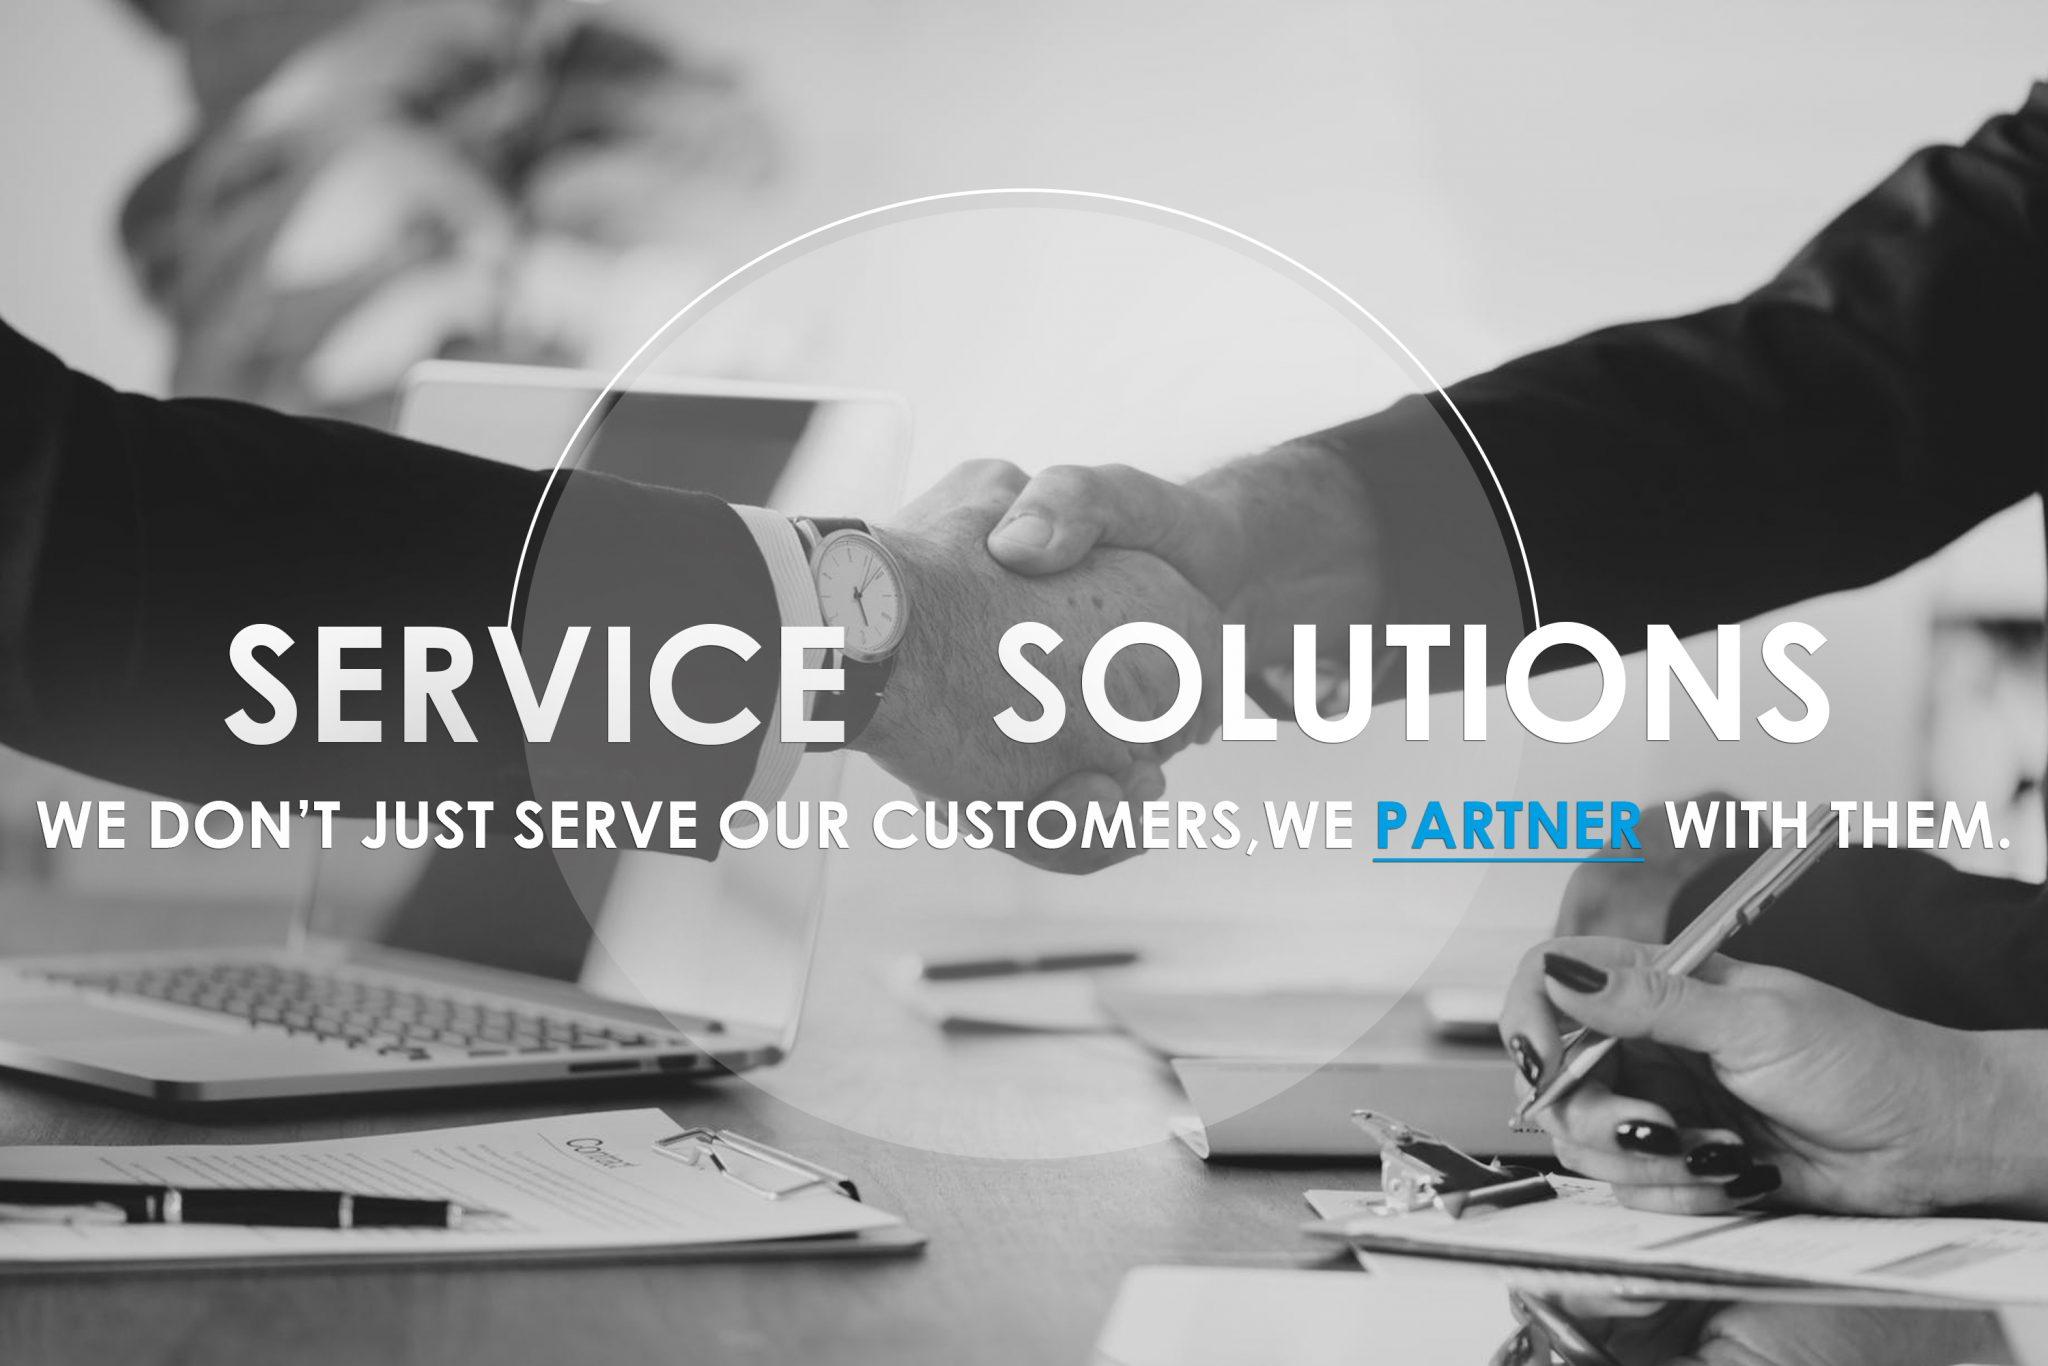 Cofficient services for NetSuite UK & SAP UK cloud ERP software